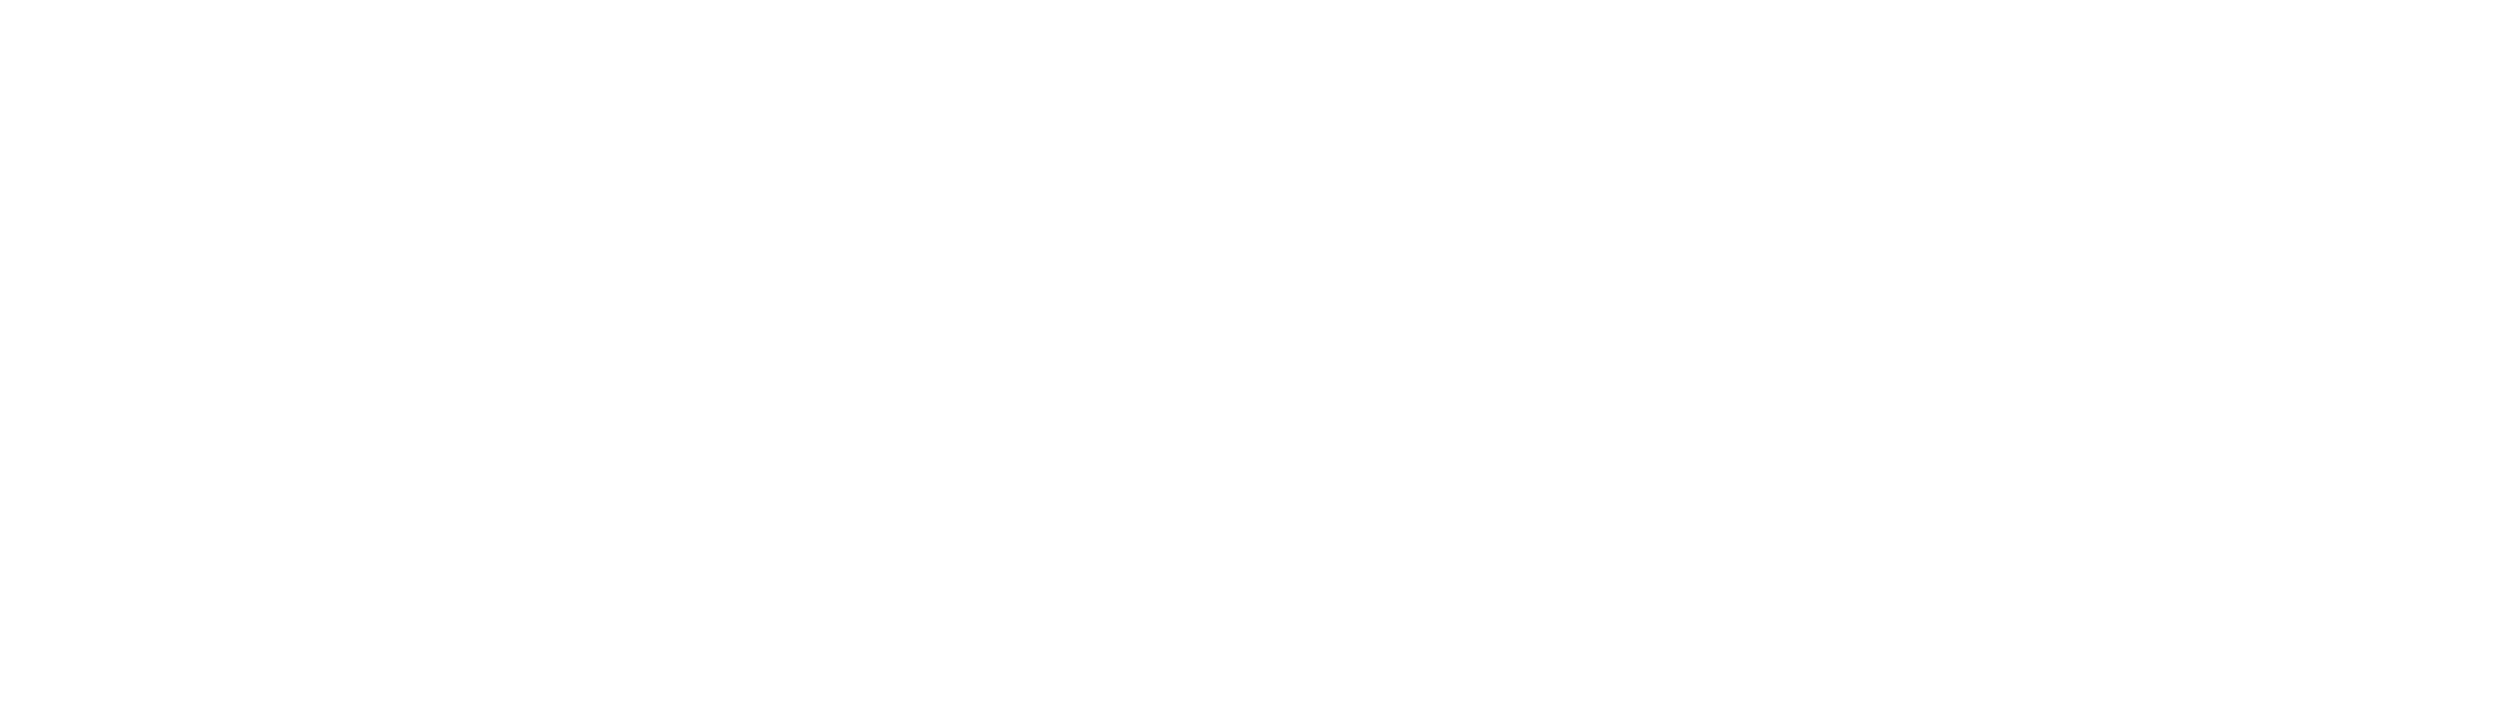 Three Stars Logo-white-01.png